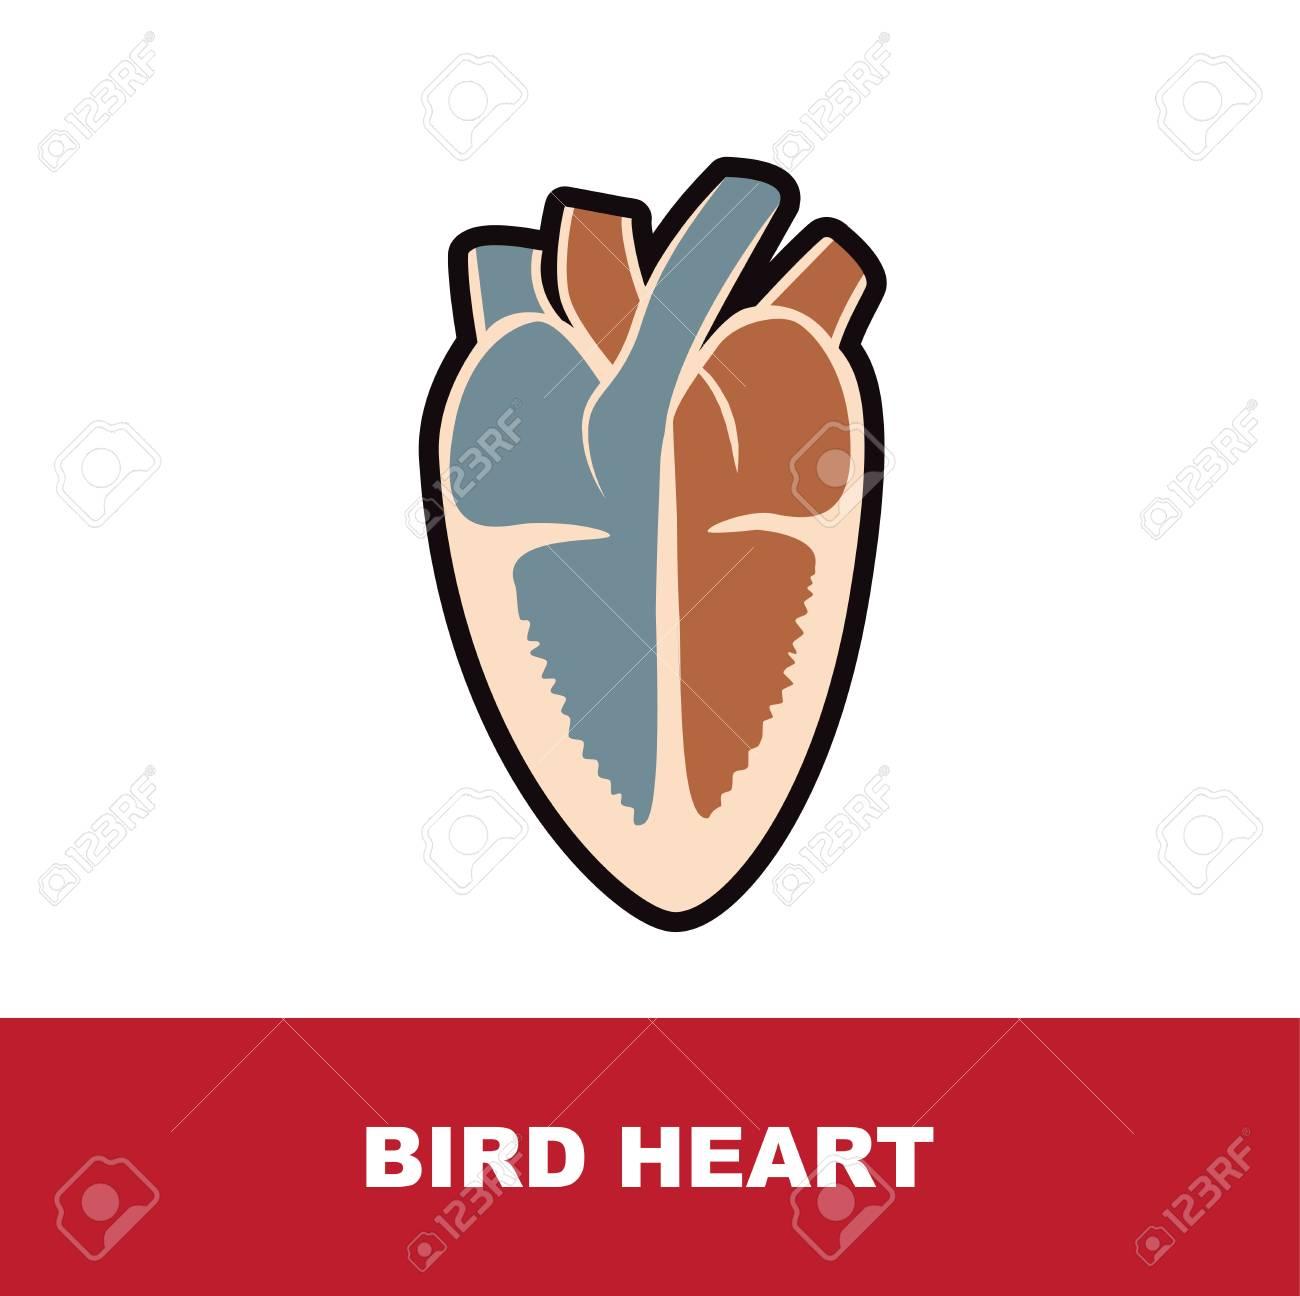 hight resolution of bird schematic heart anatomy vector illustration on white stock vector 89405904